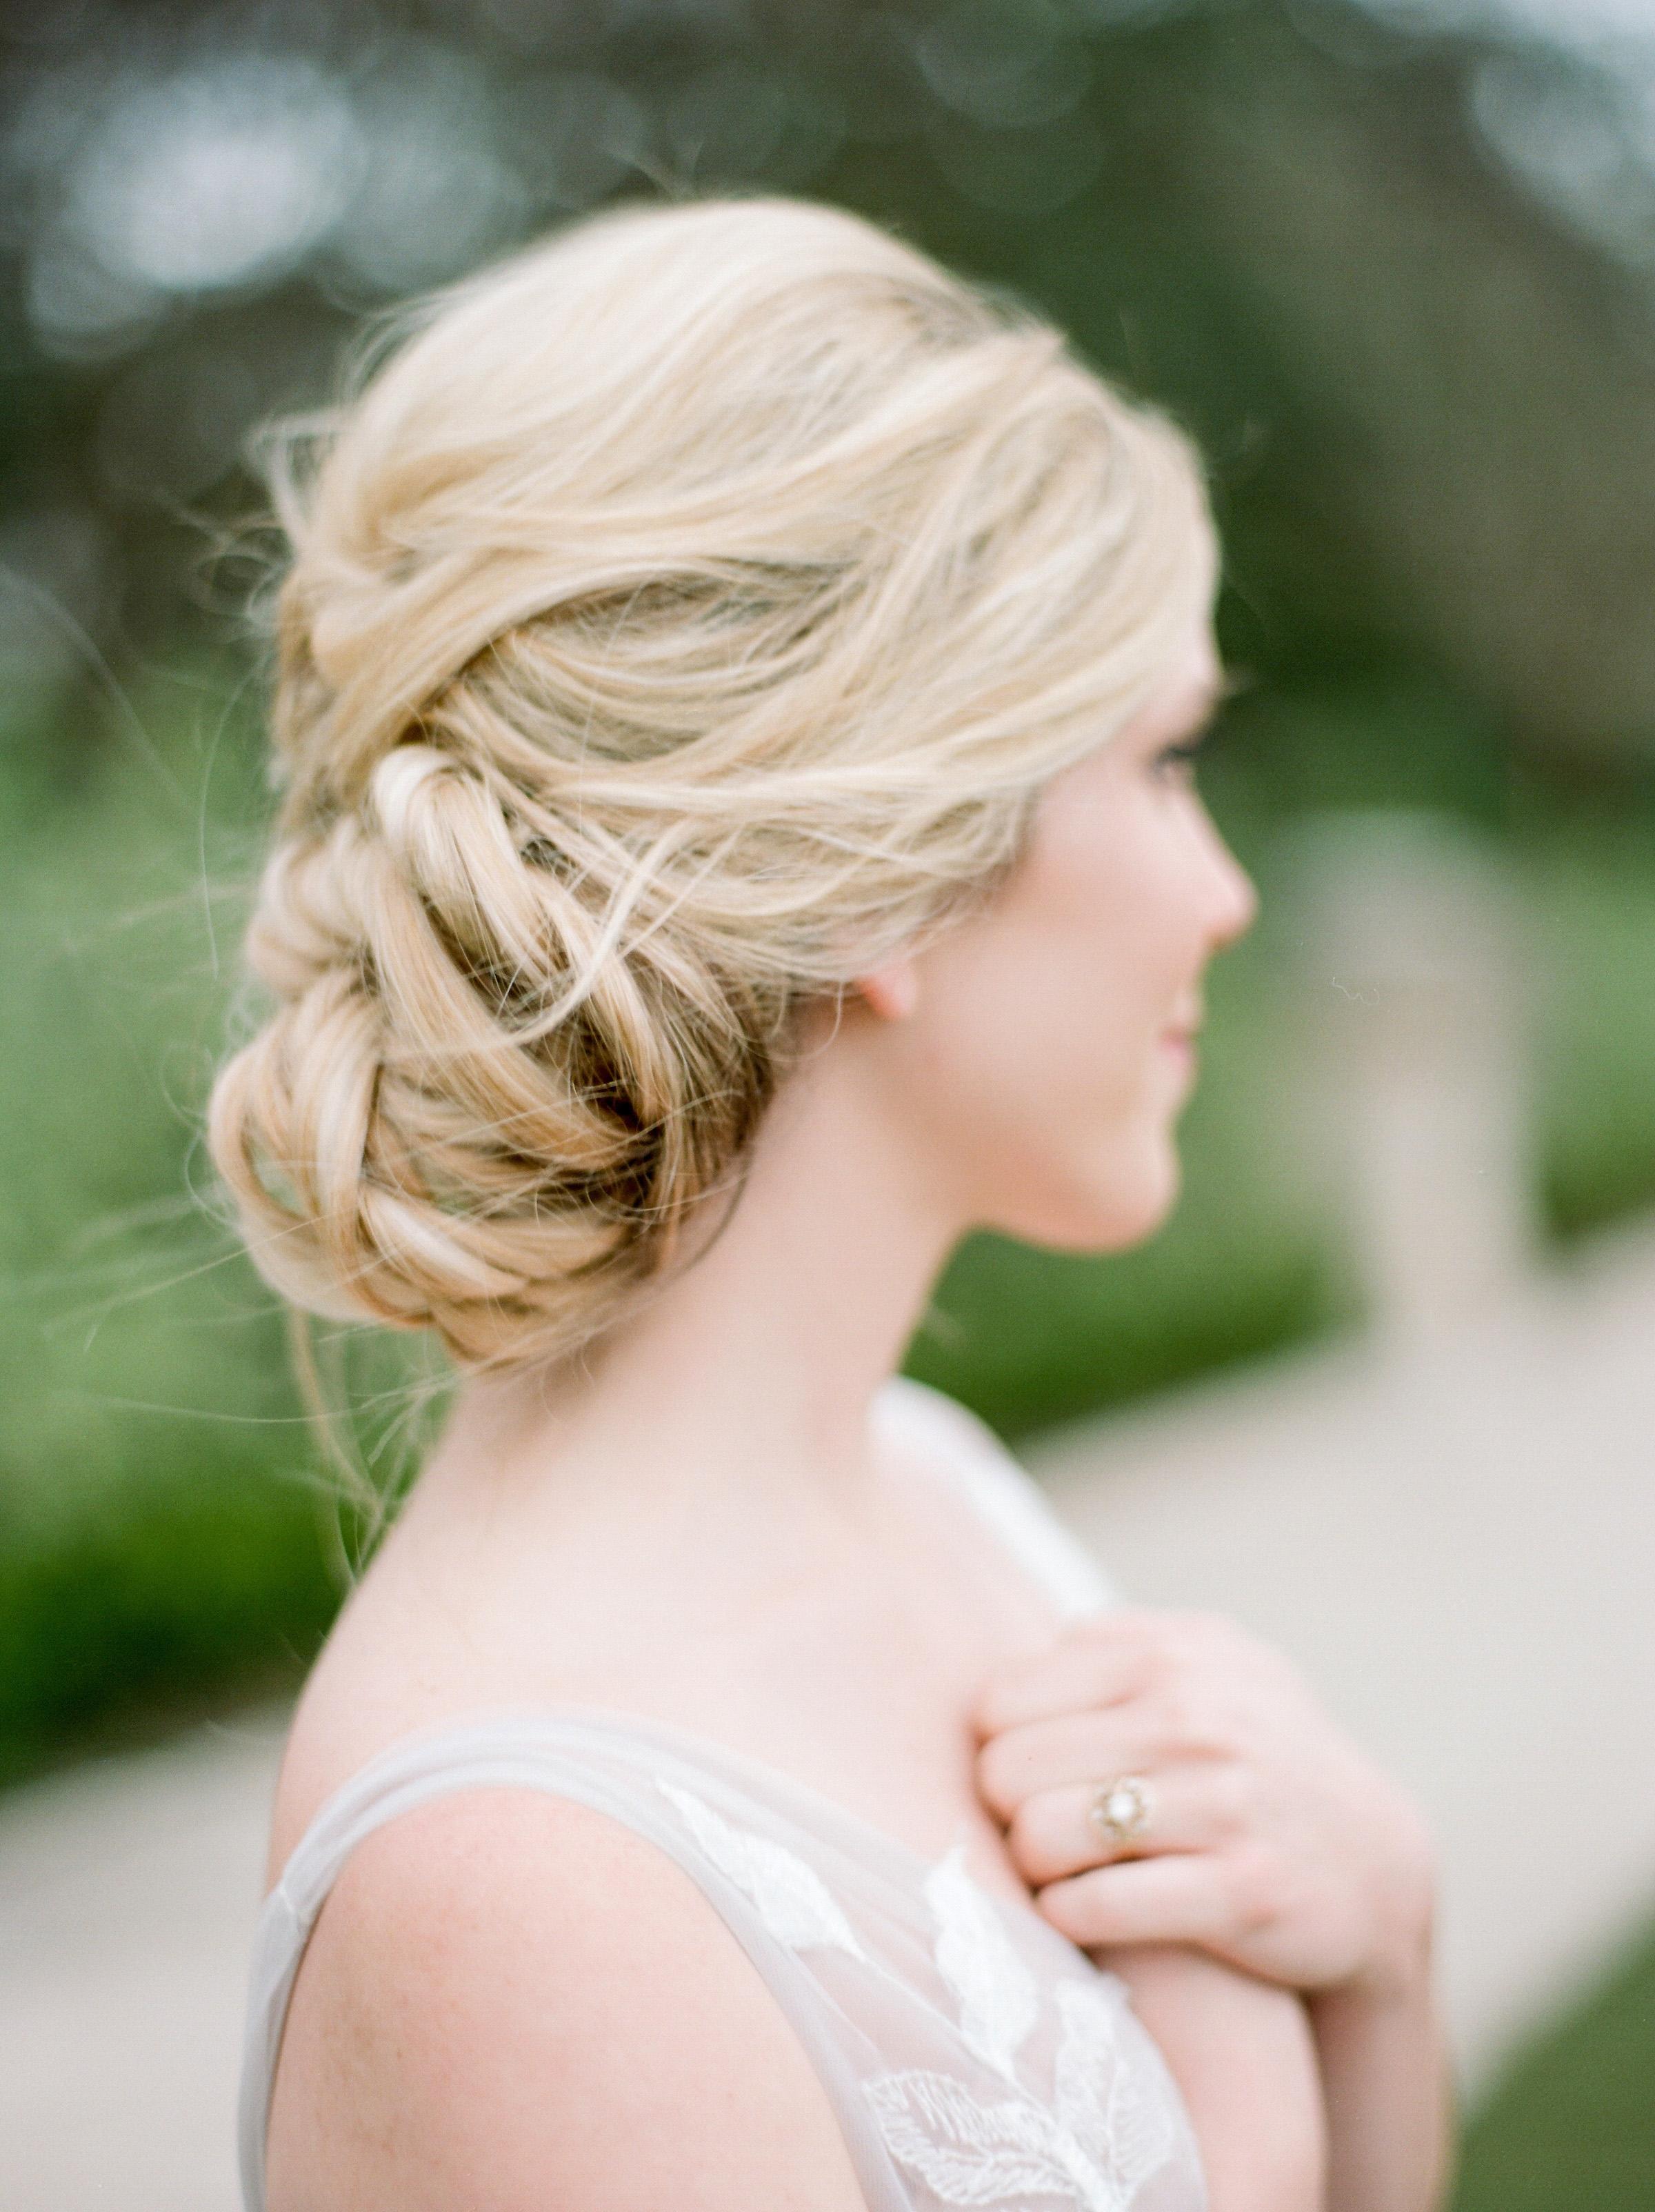 McGovern-Centennial-Gardens-Houston-Texas-Wedding-Venue-Josh-Dana-Fernandez-Photography-Film-Destination-Fine-Art-Luxury-Top-Best-Austin-Dallas-Magnolia-Rouge-Jennifer-Laura-Design-10.jpg